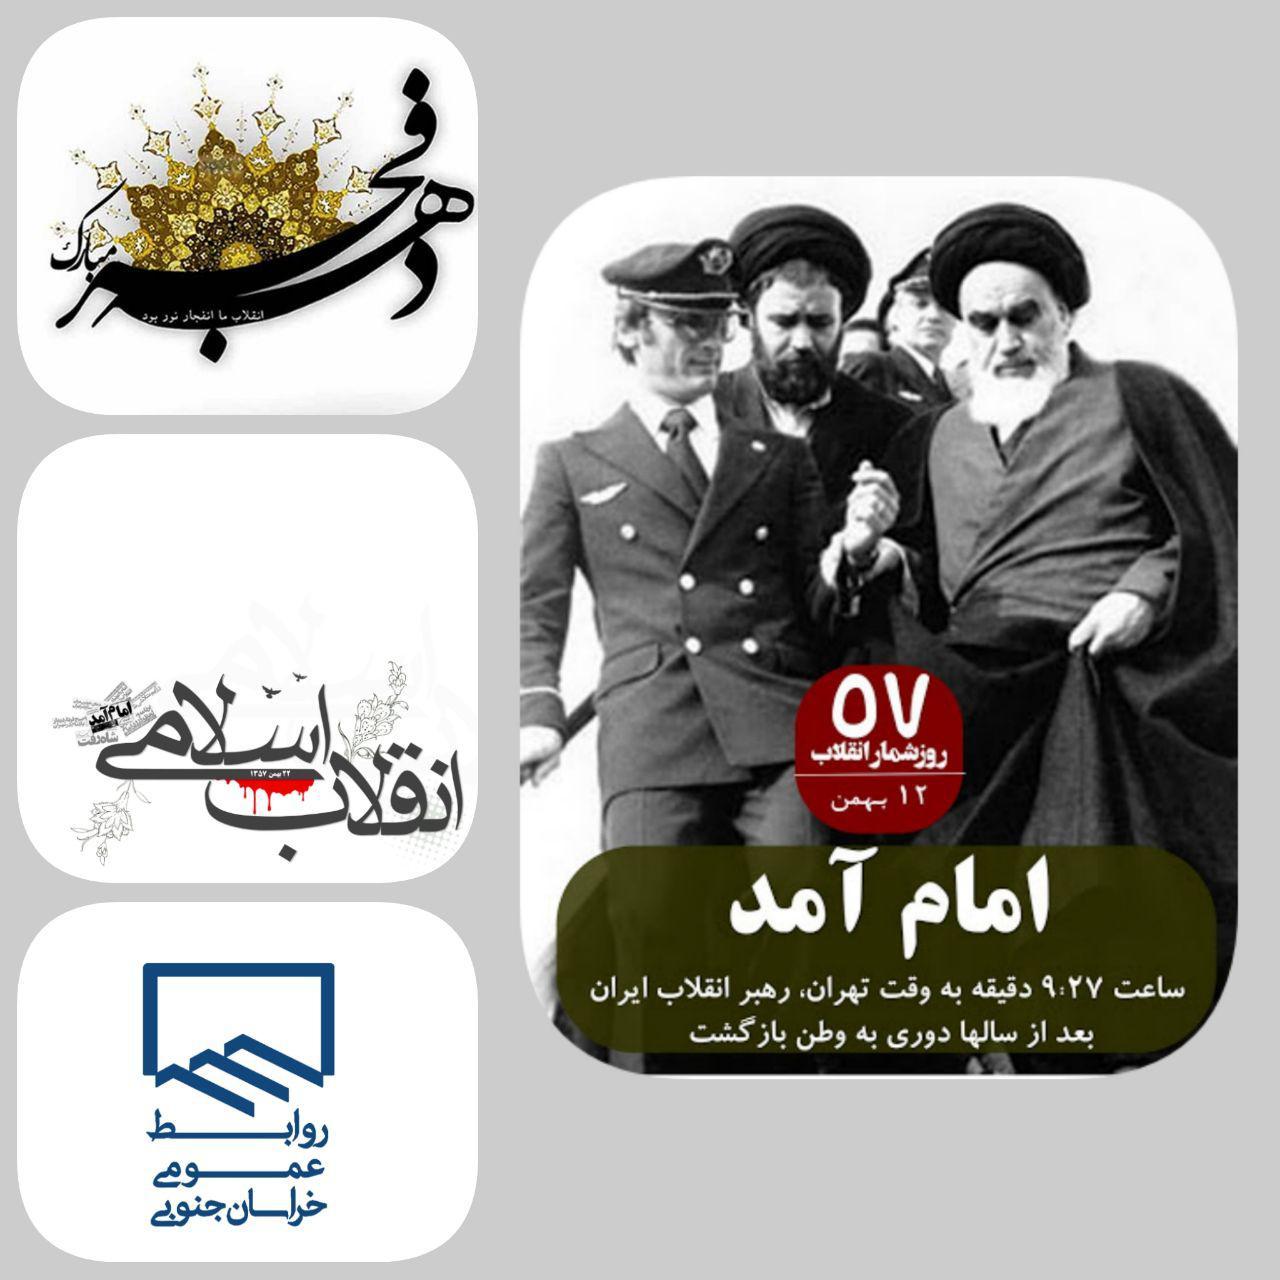 دهه فجر انقلاب اسلامی گرامی باد